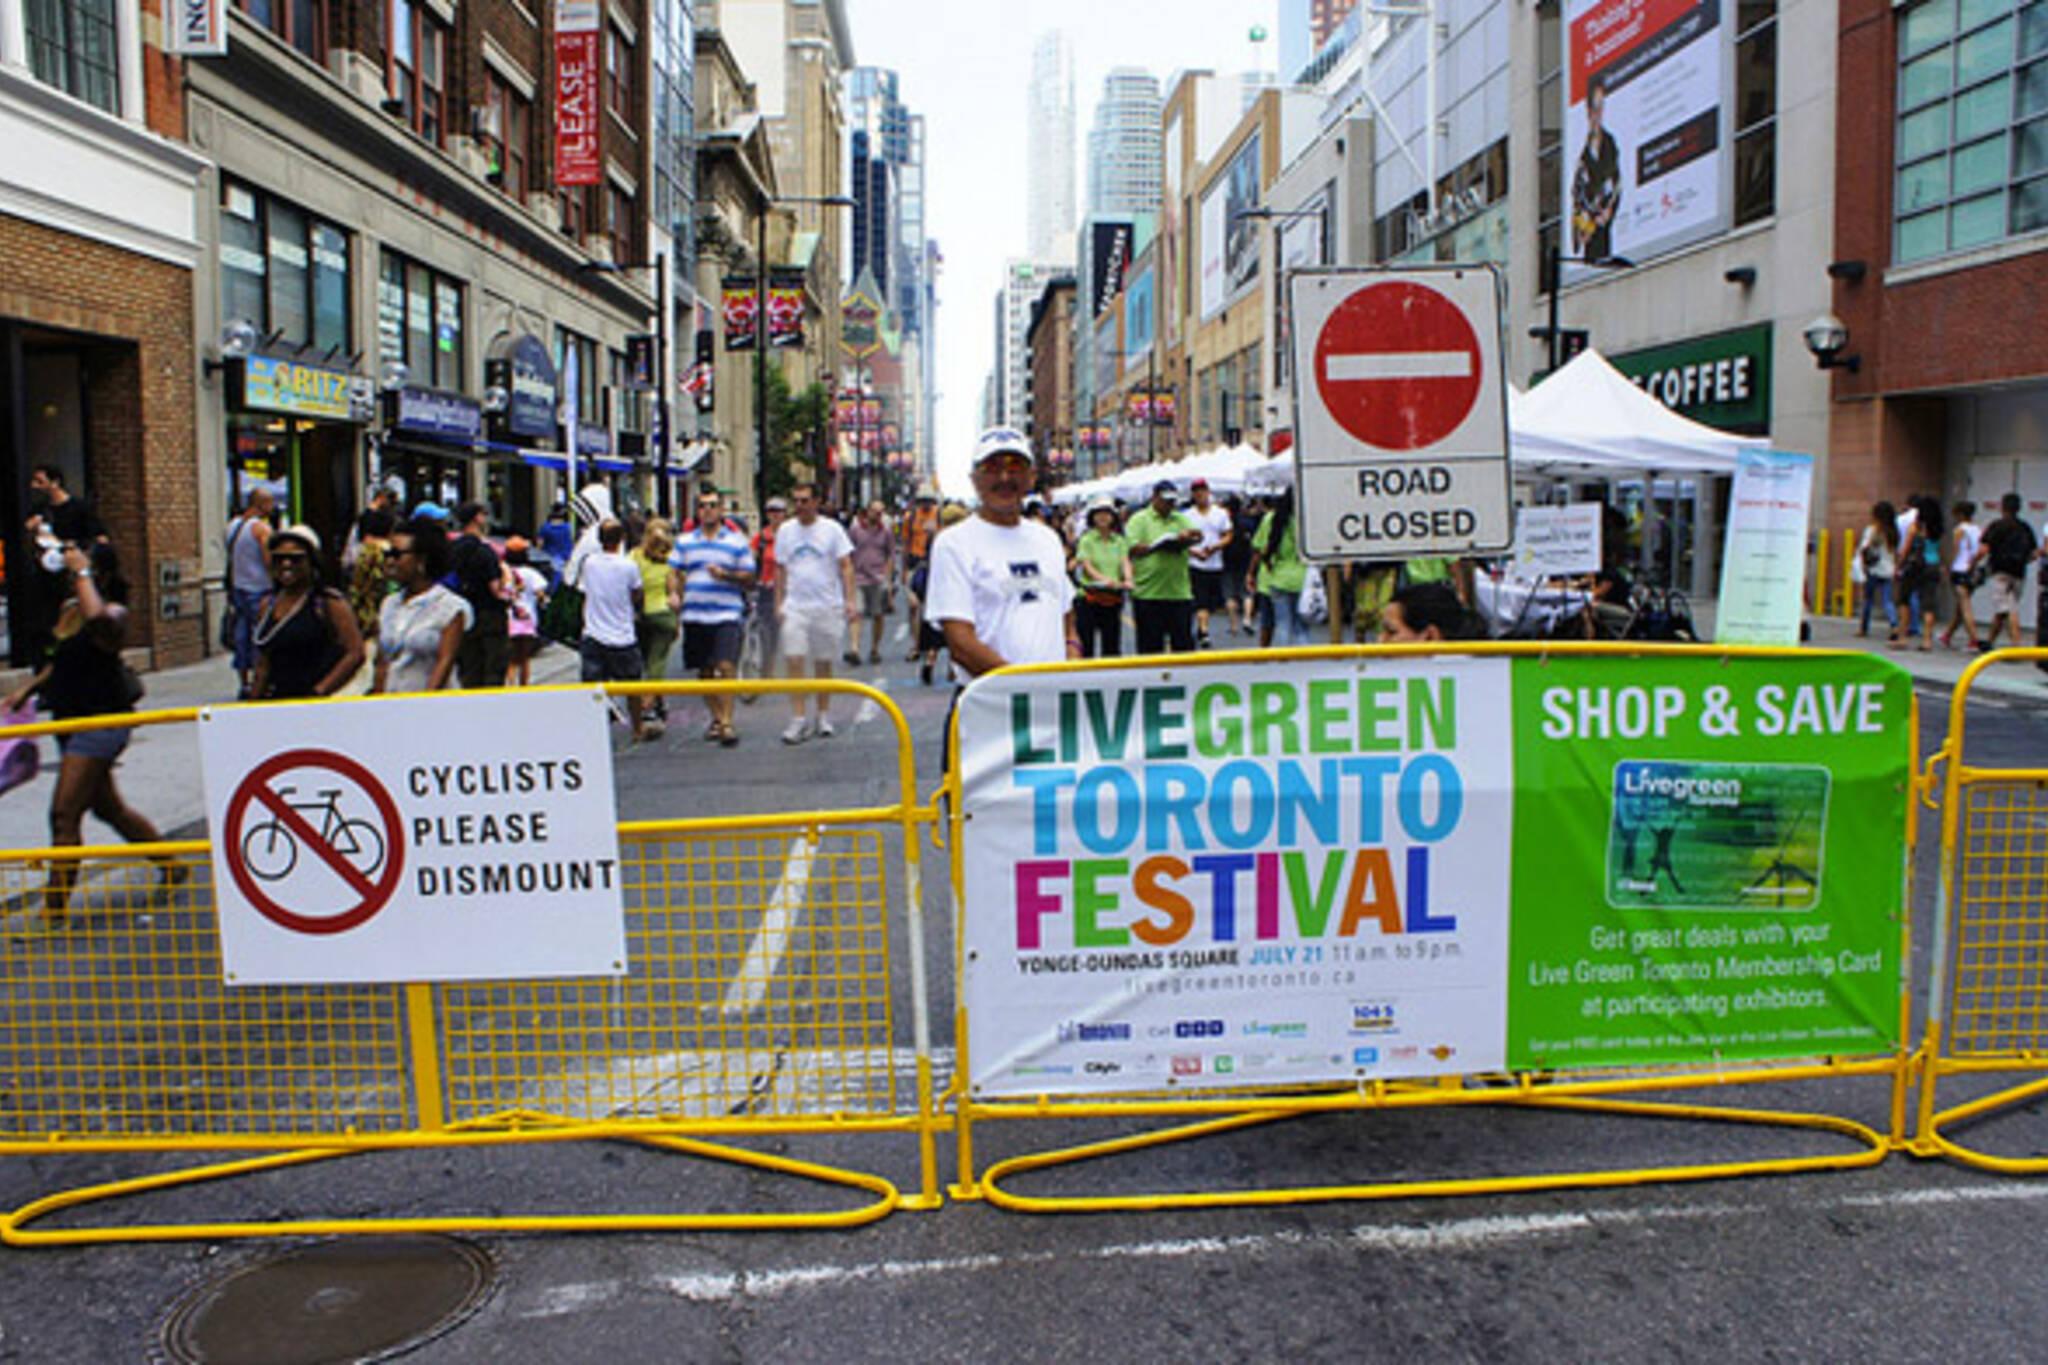 Live Green Festival Toronto